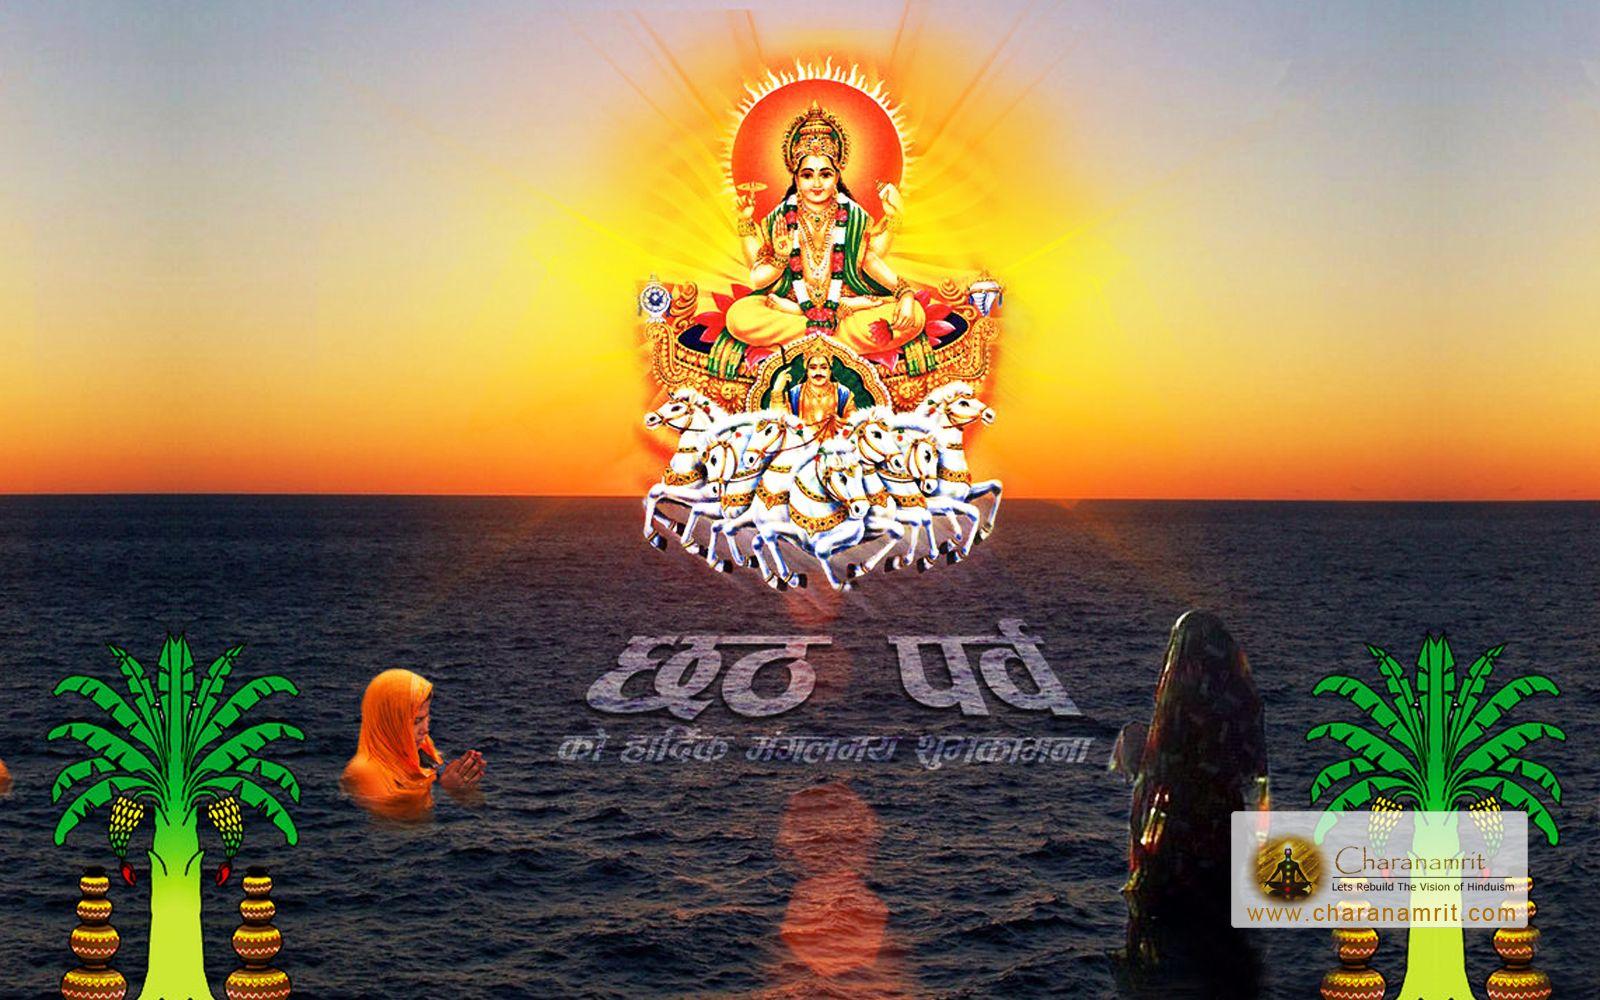 charanamrit provides you chhathpooja hd wallpapers